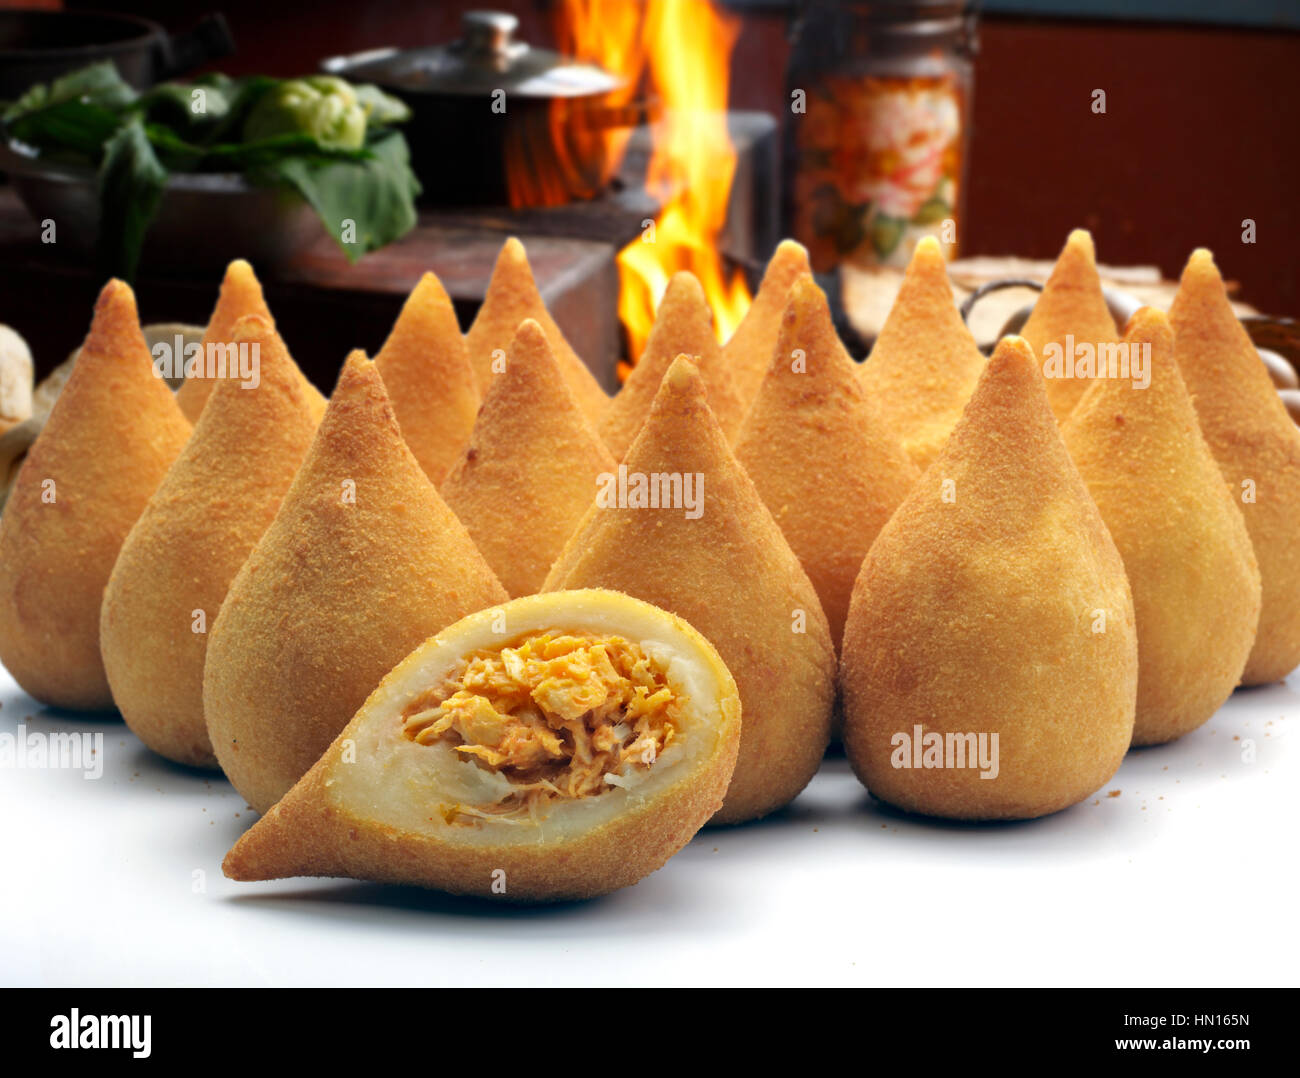 Coxinha de Galinha - Brazilian deep fried chicken snack, popular at local parties. - Stock Image